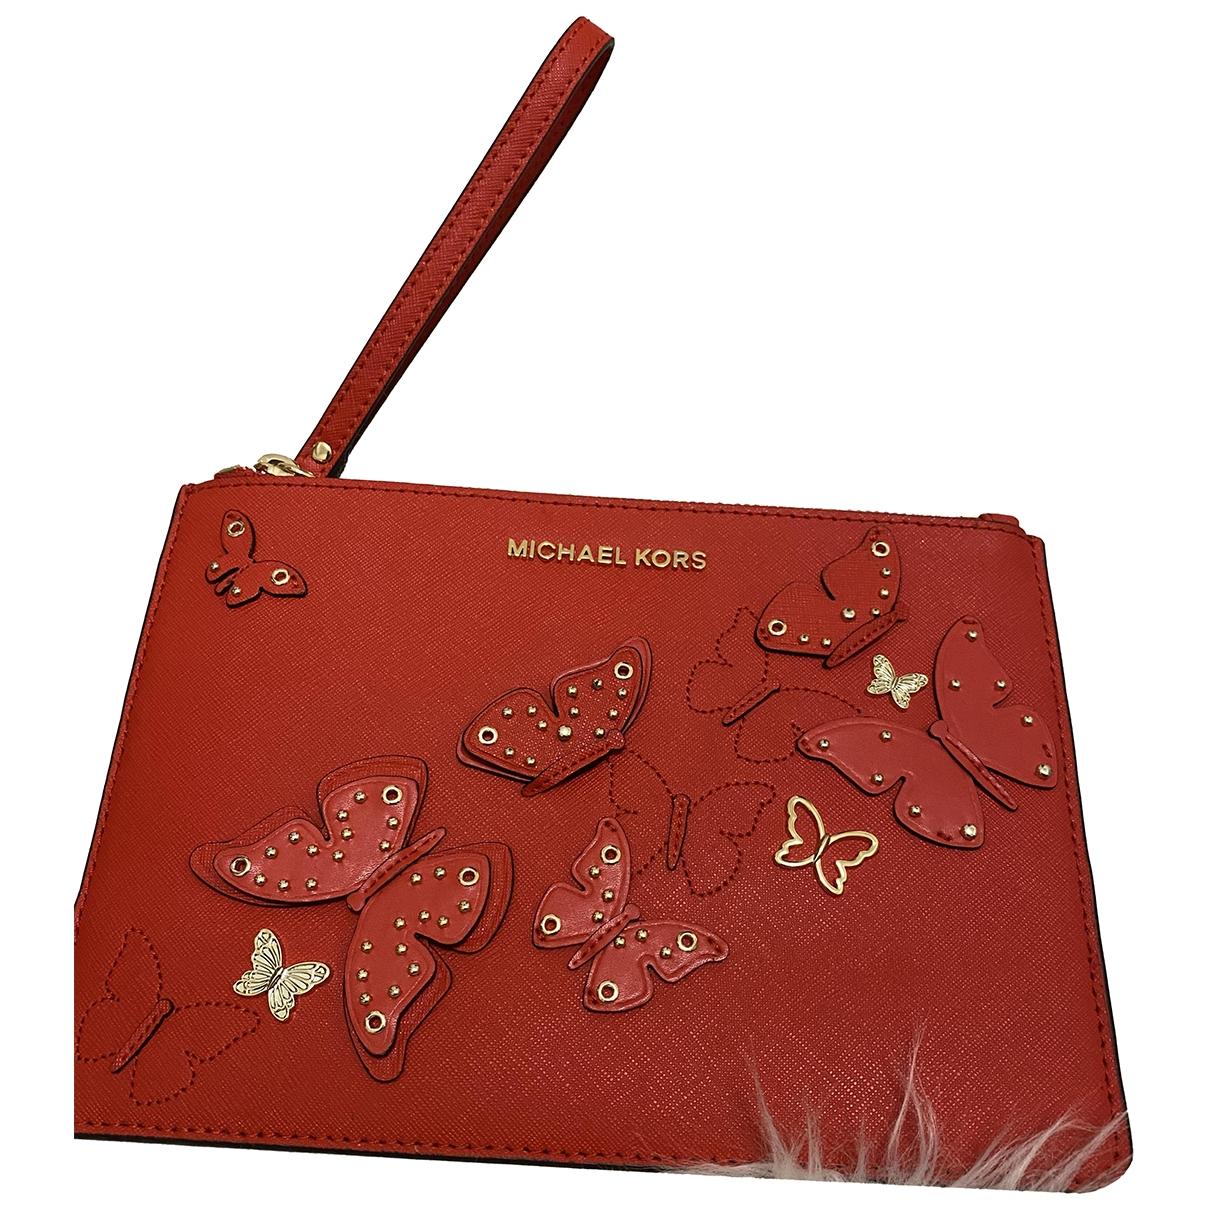 Michael Kors Jet Set Red Leather Clutch bag for Women \N